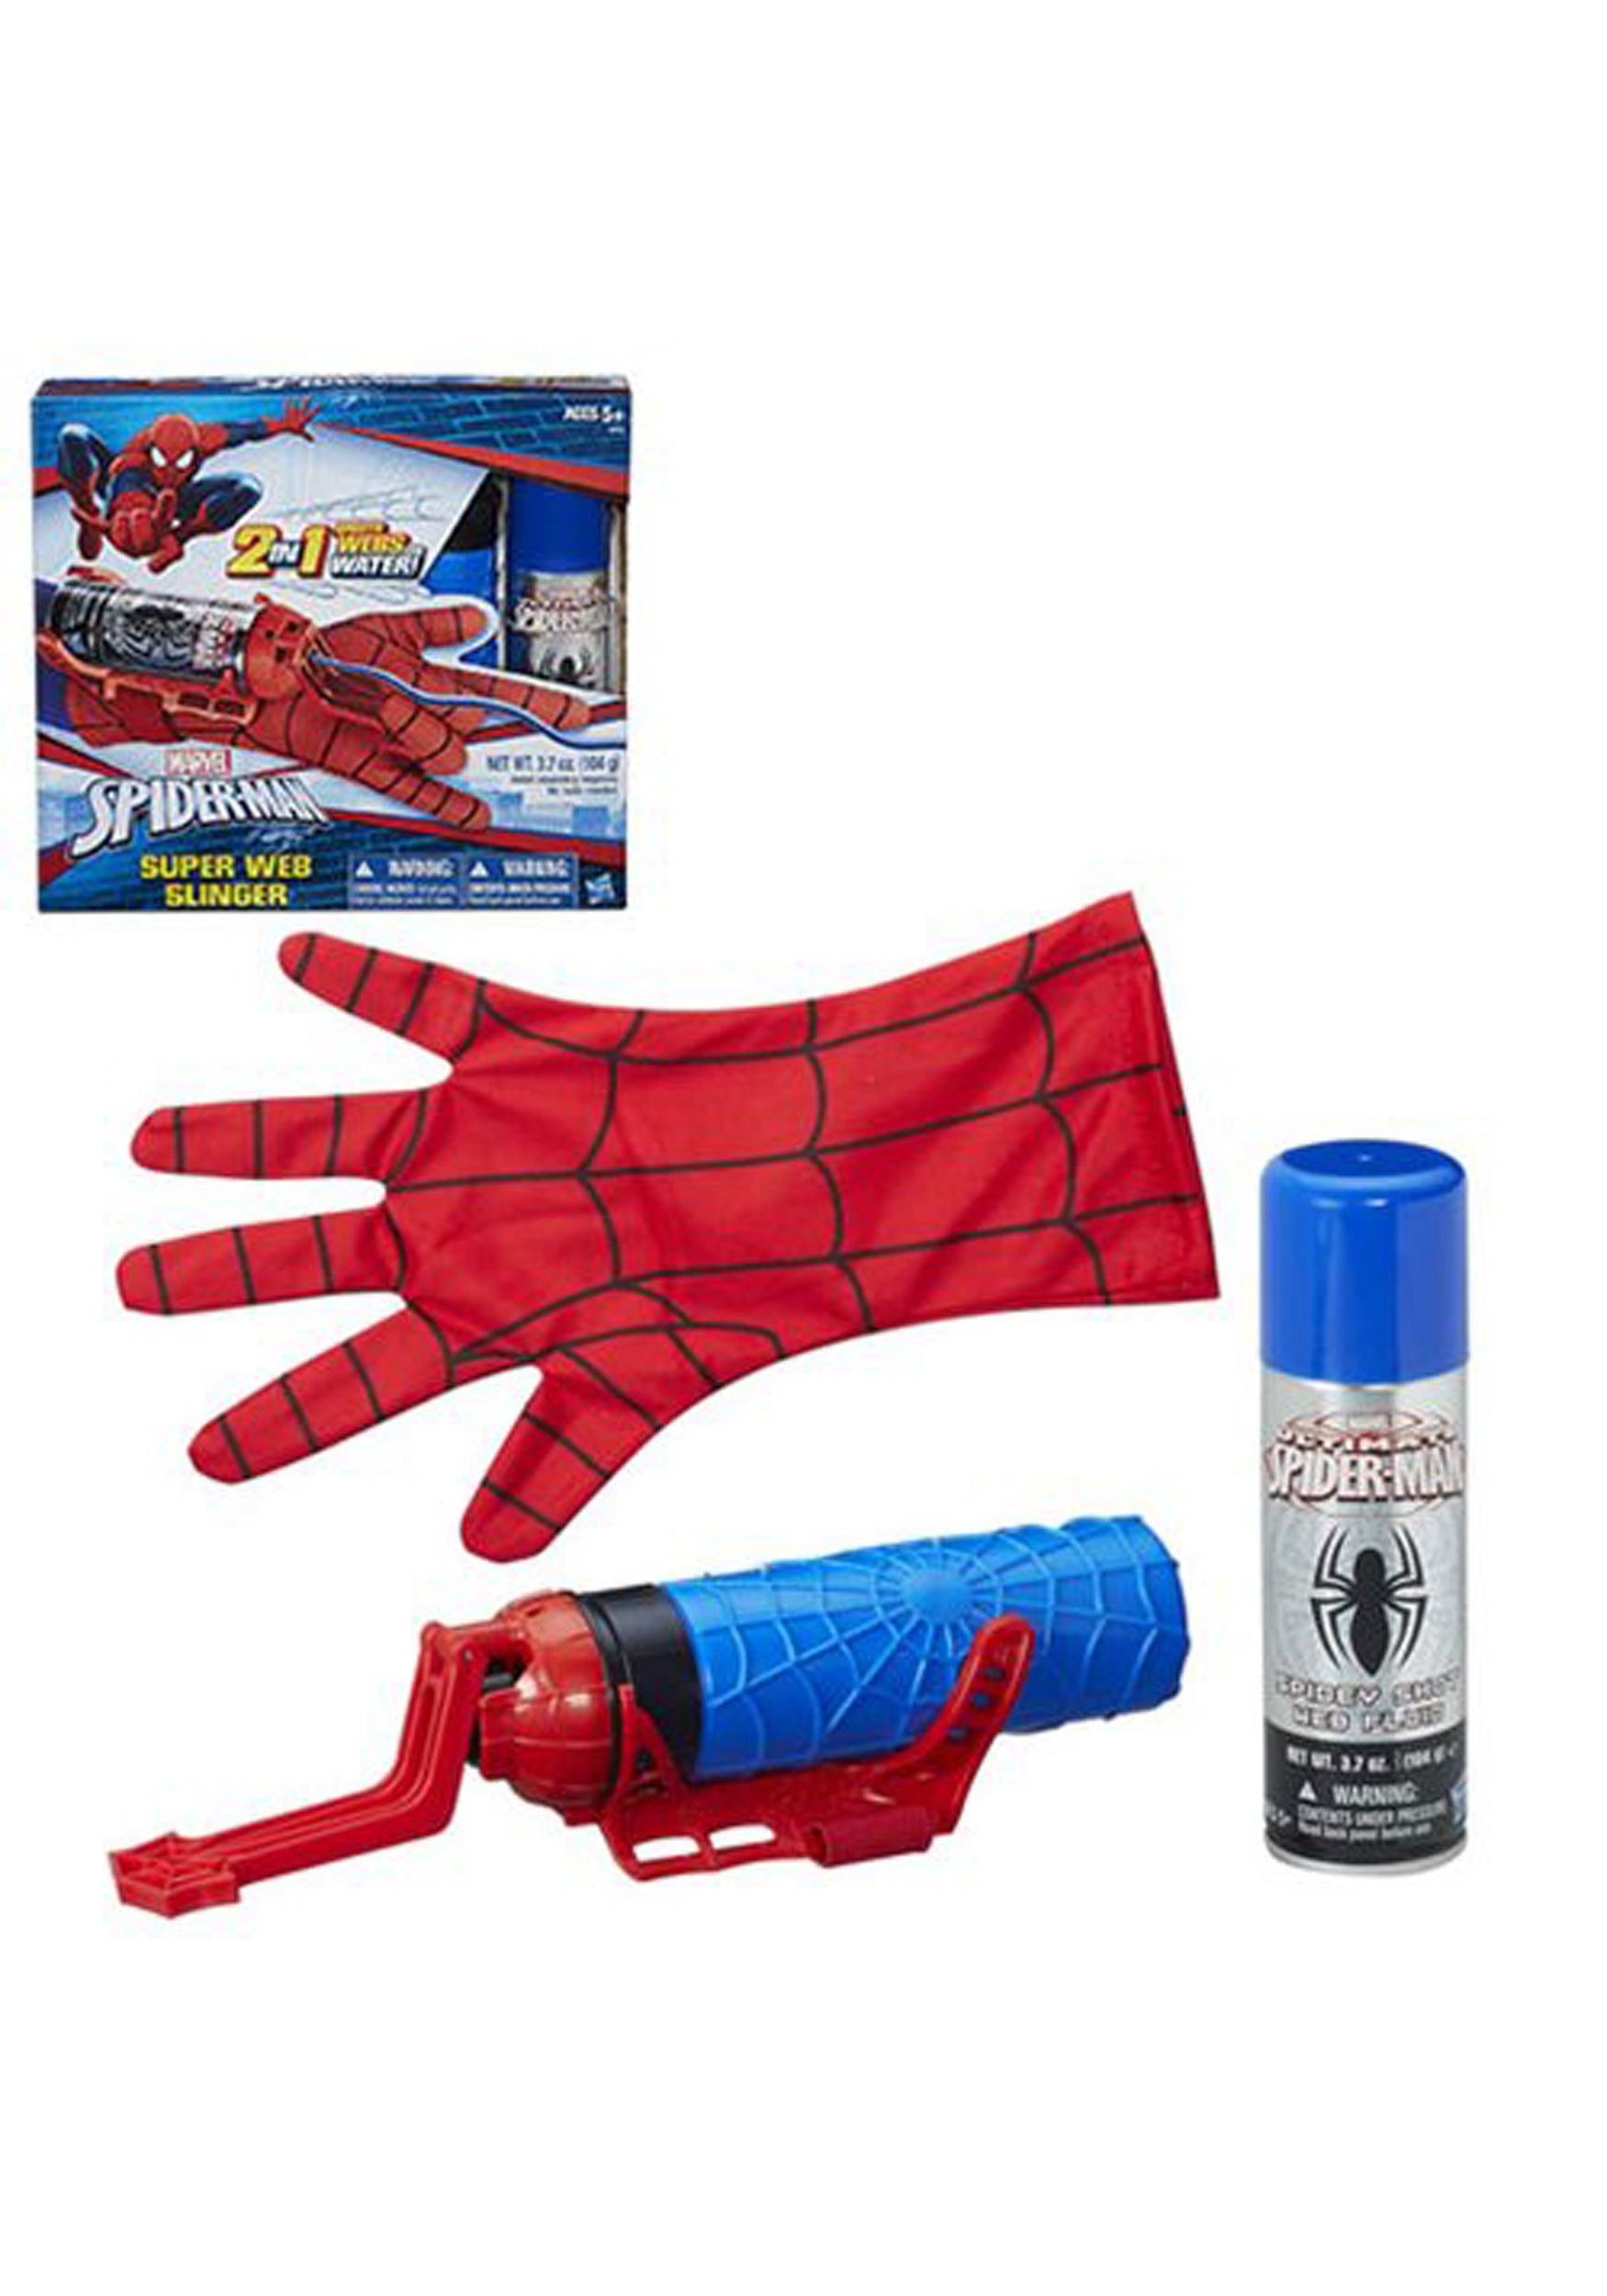 Marvel Spider-Man Super Web Slinger Blaster Gun